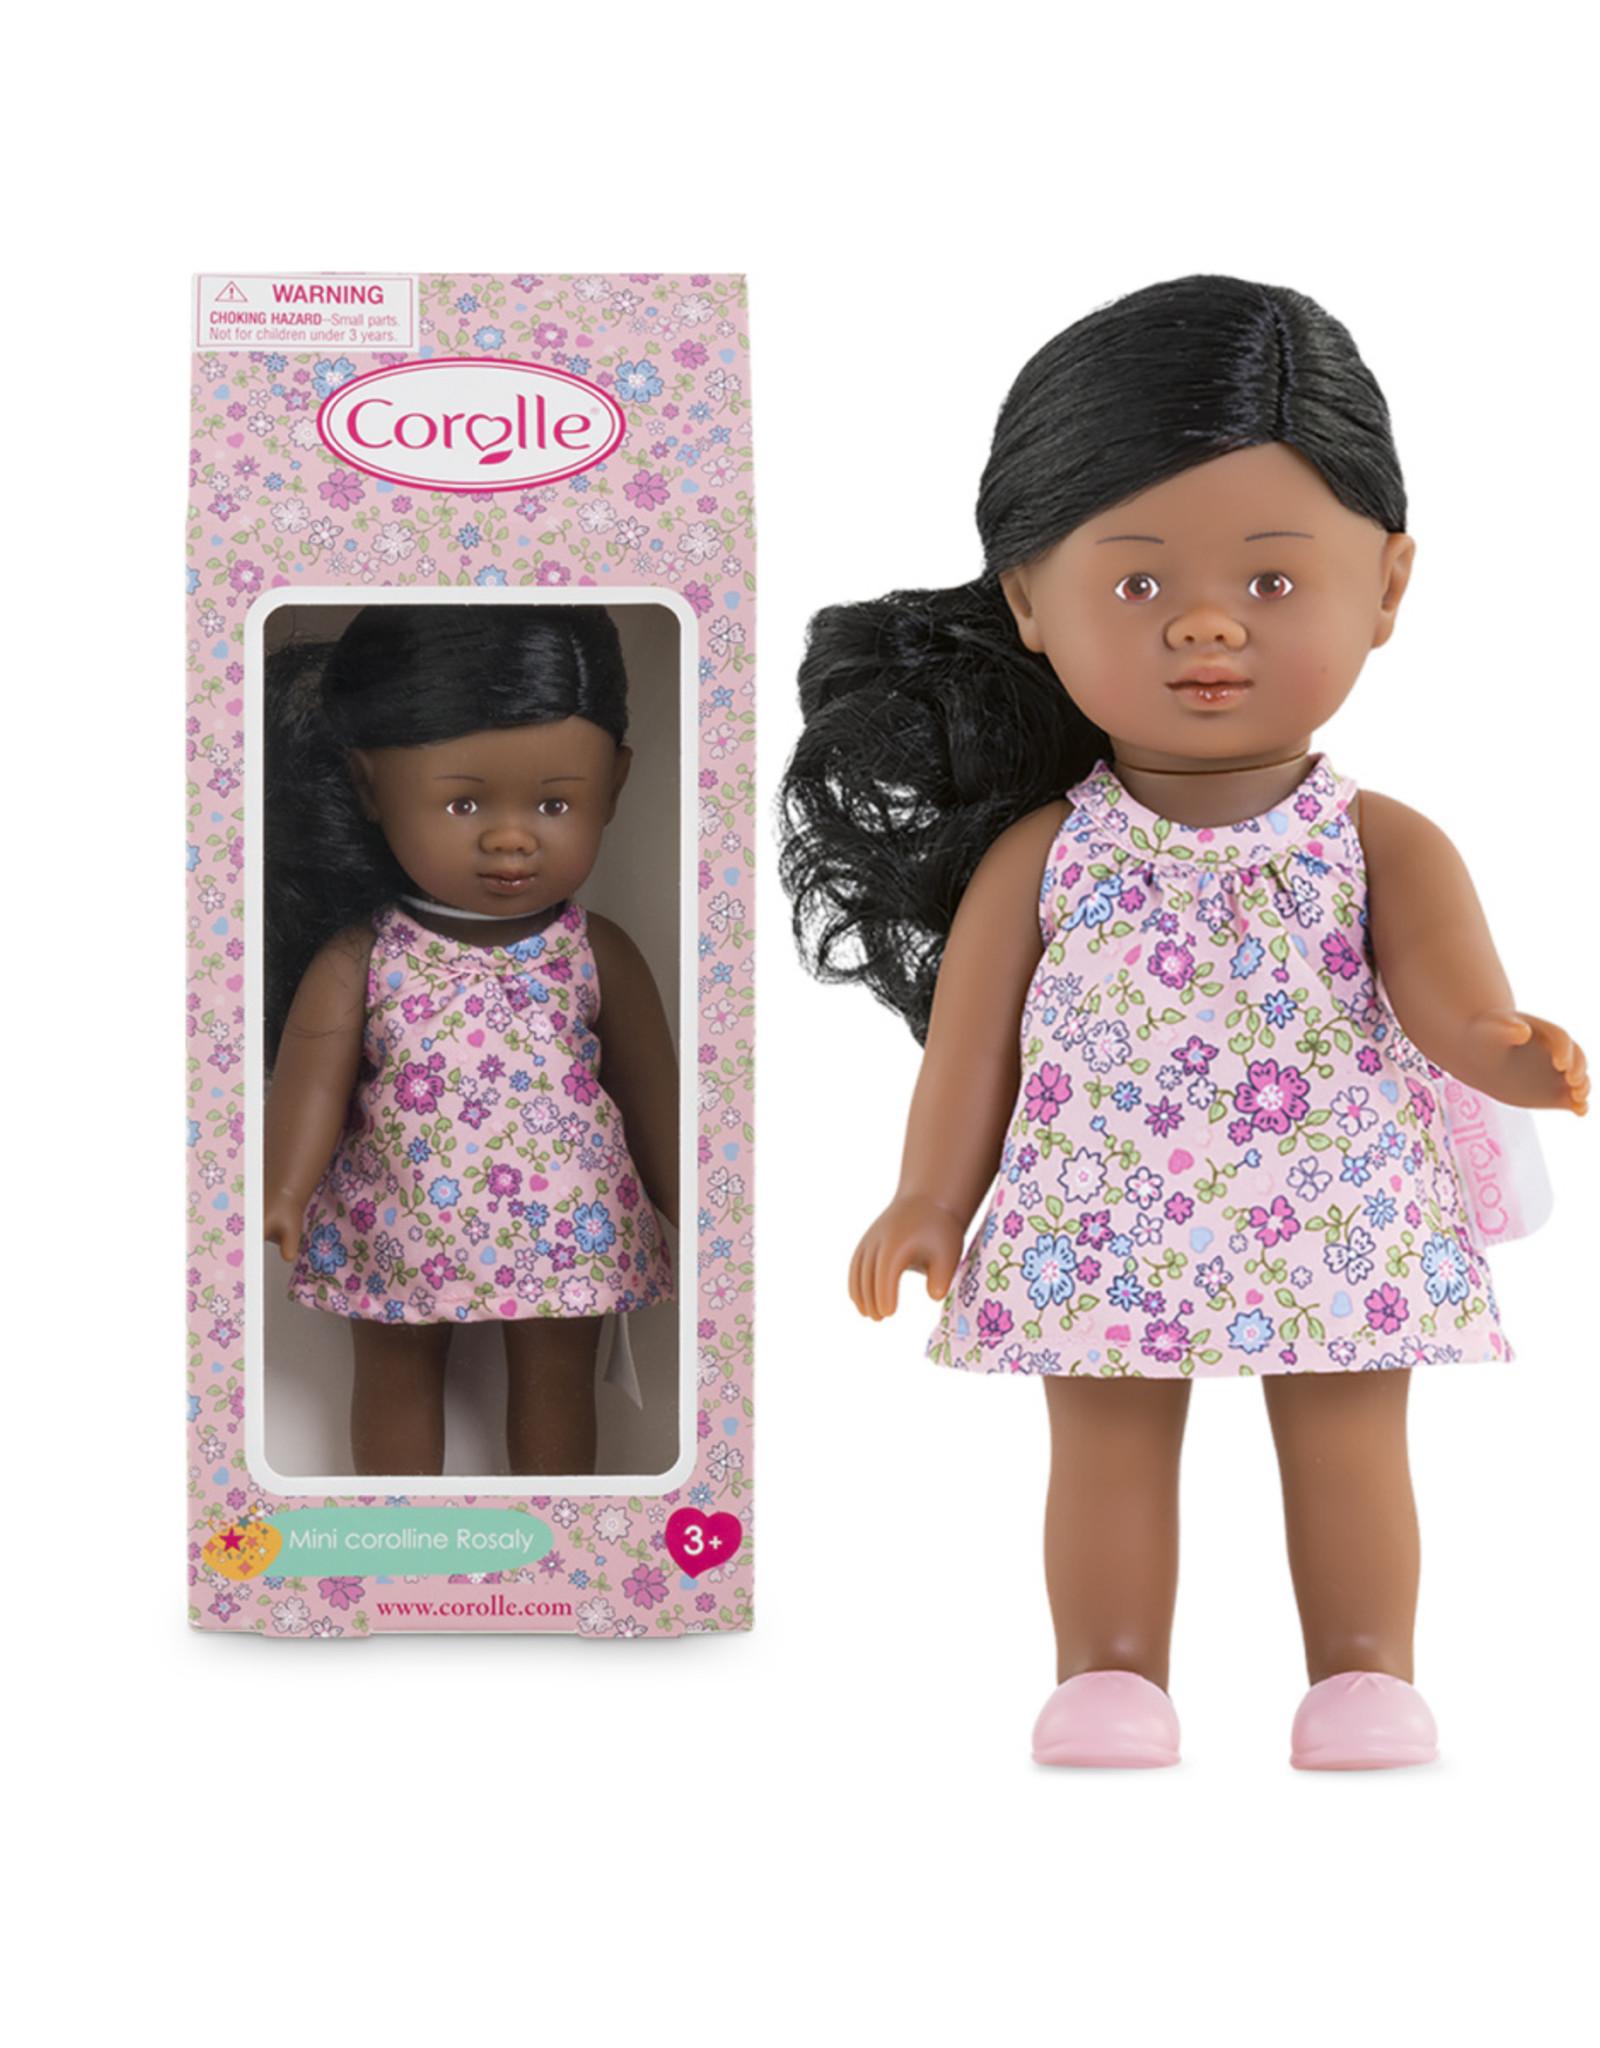 Corolle Mini Rosaly